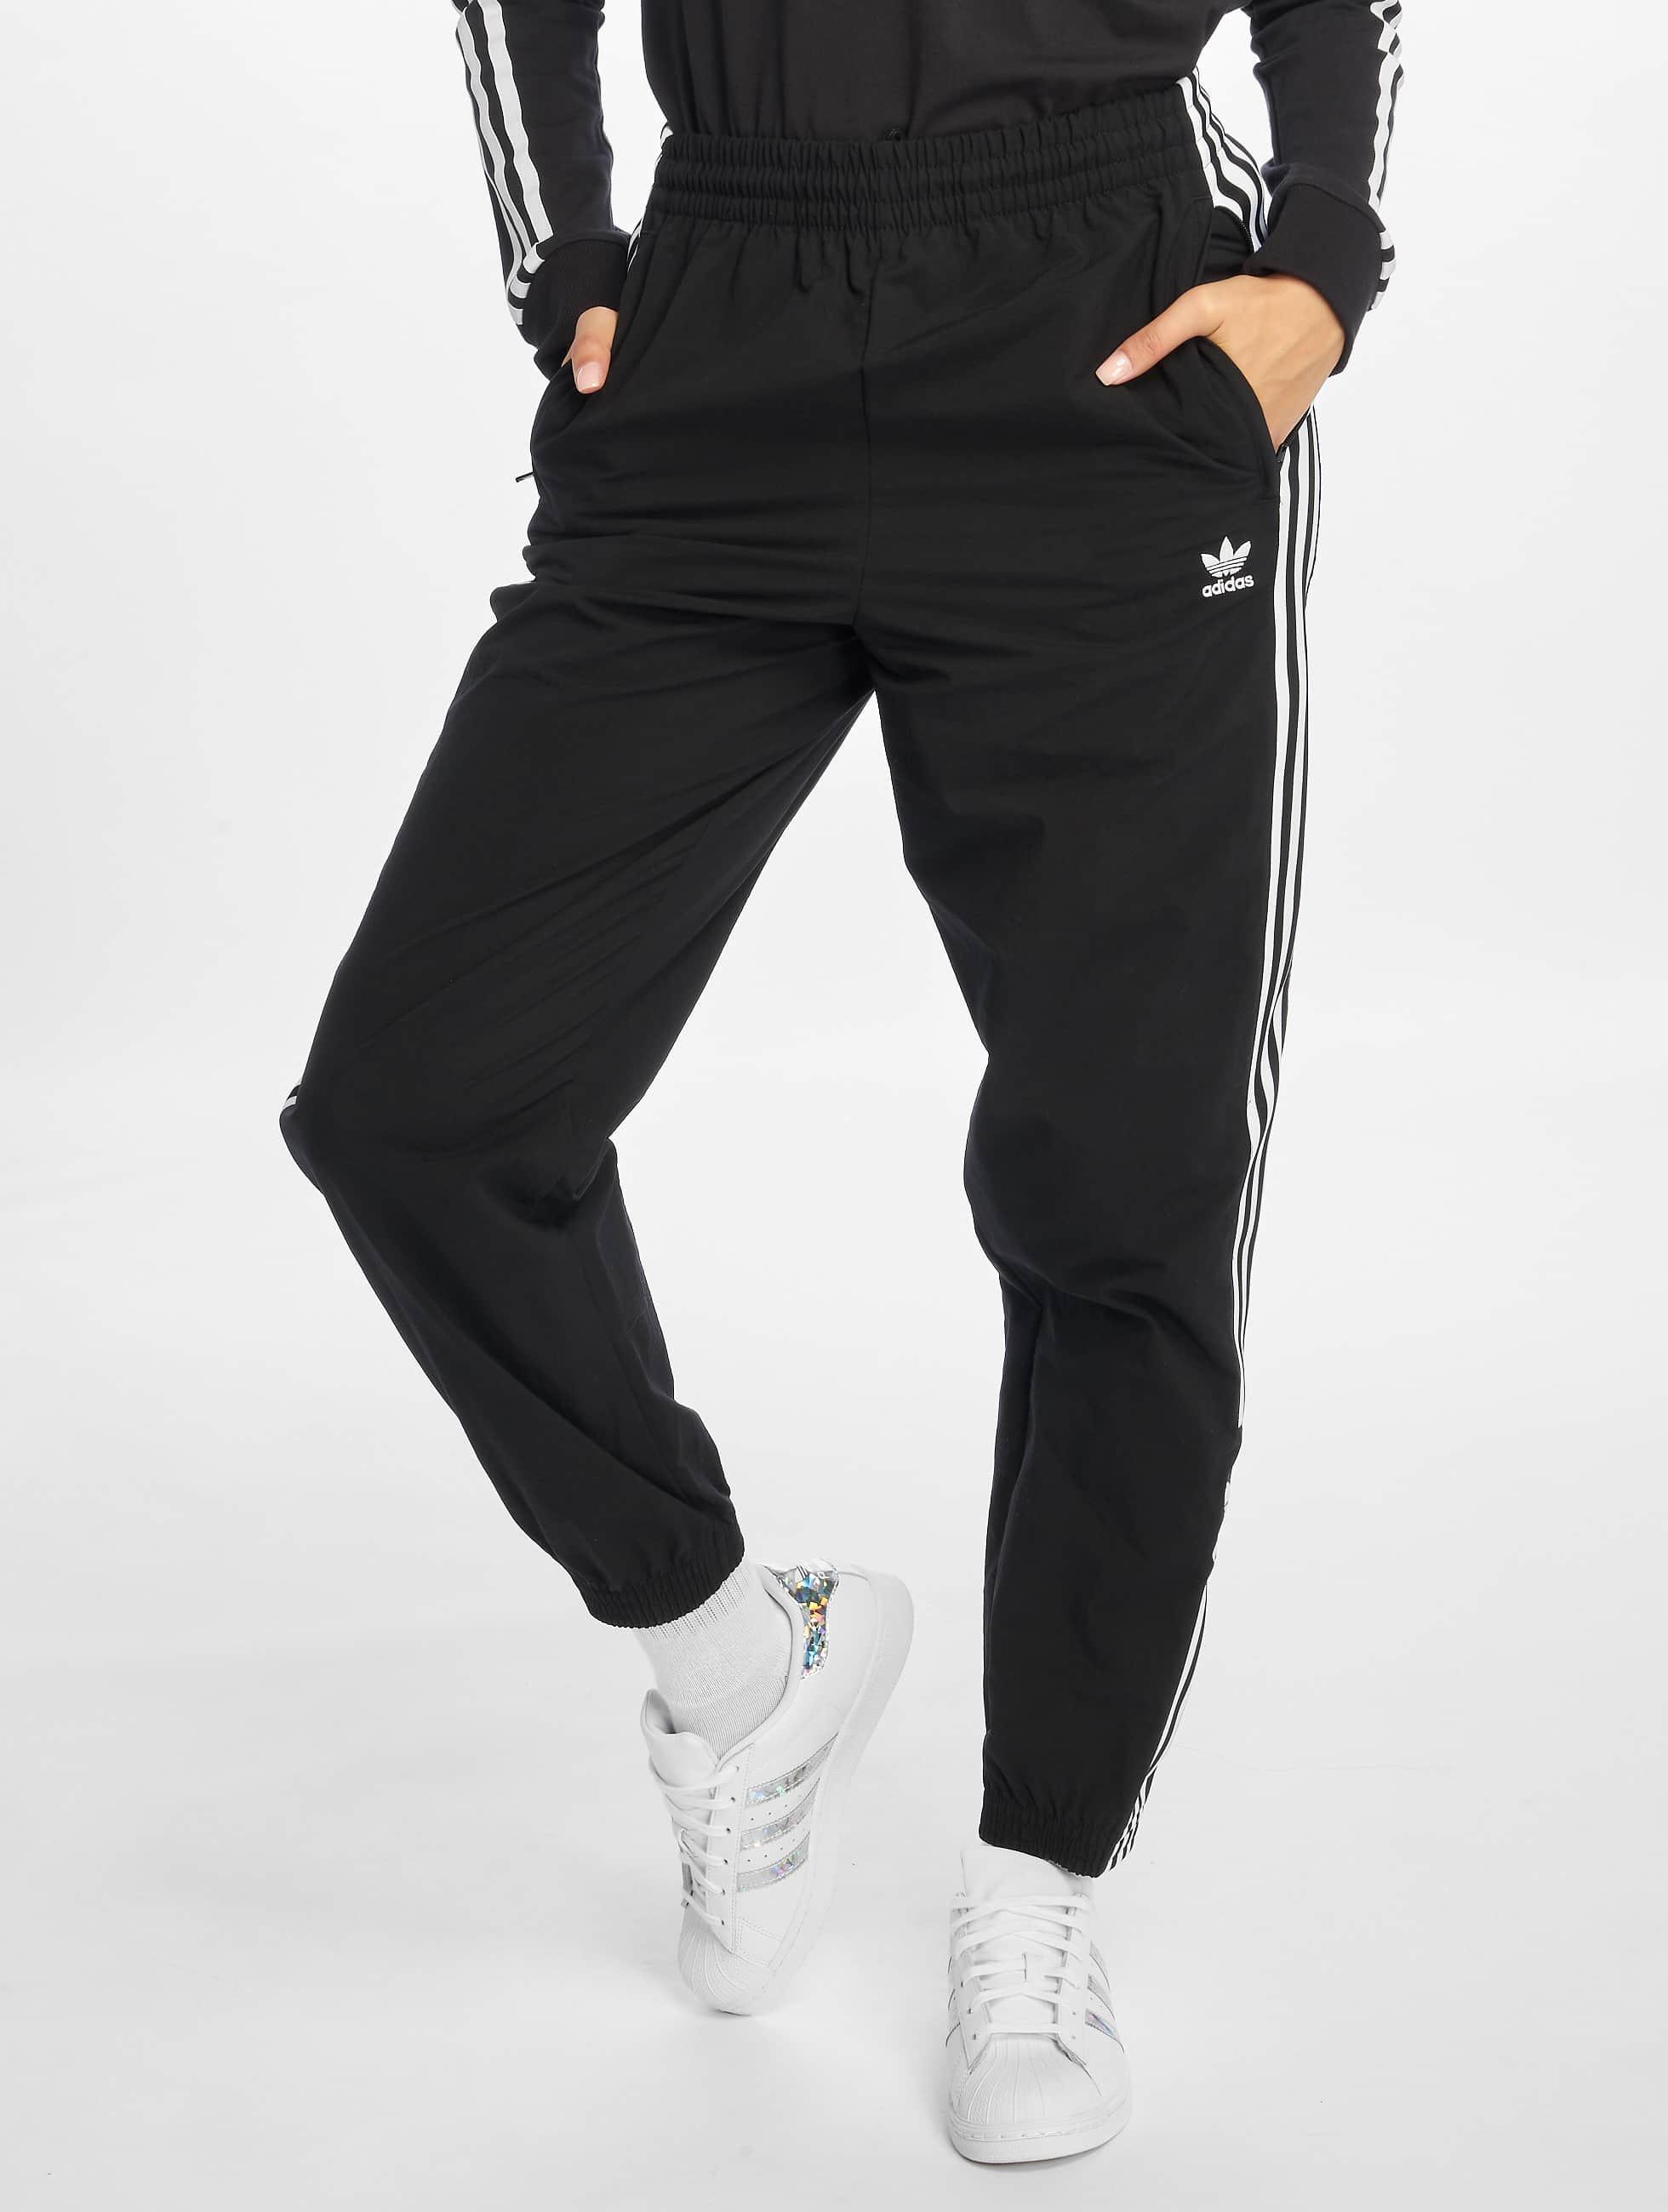 Adidas Originals Lock Up Track Pants Black